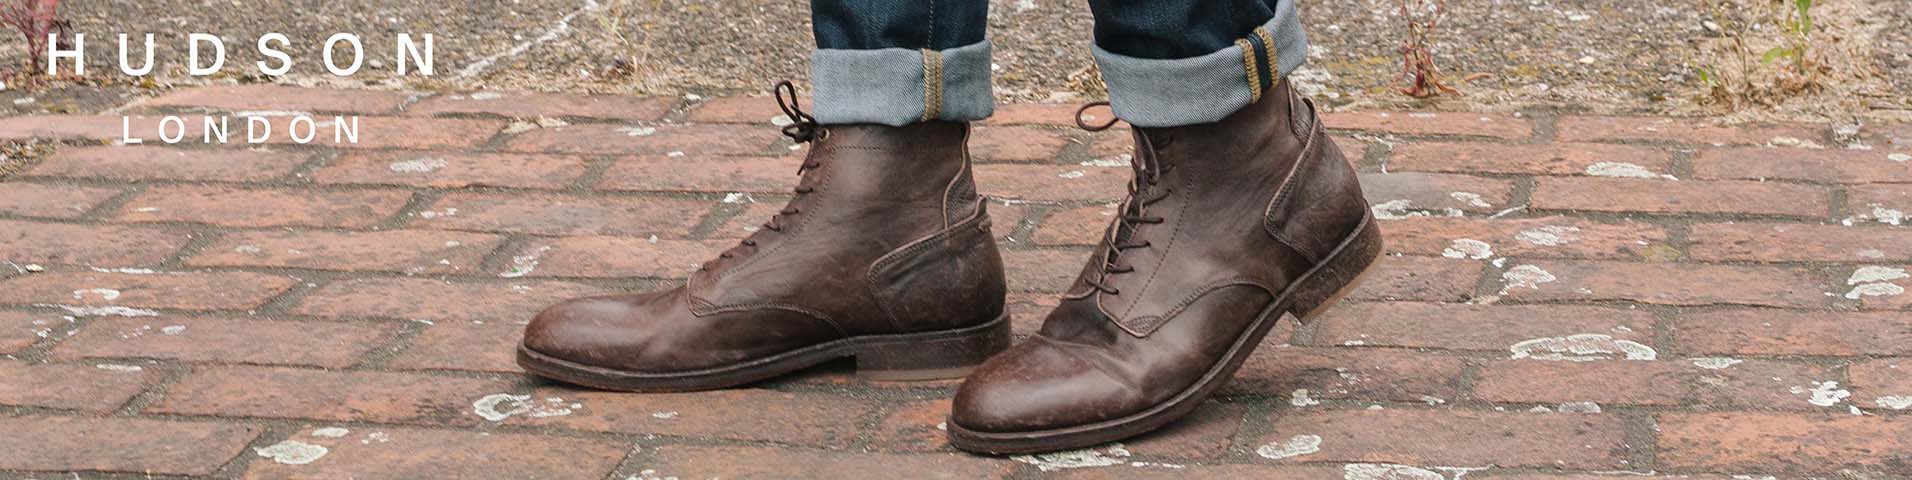 London Hudson Schuhe HerrenZalando London Für Hudson OZTkXPiu